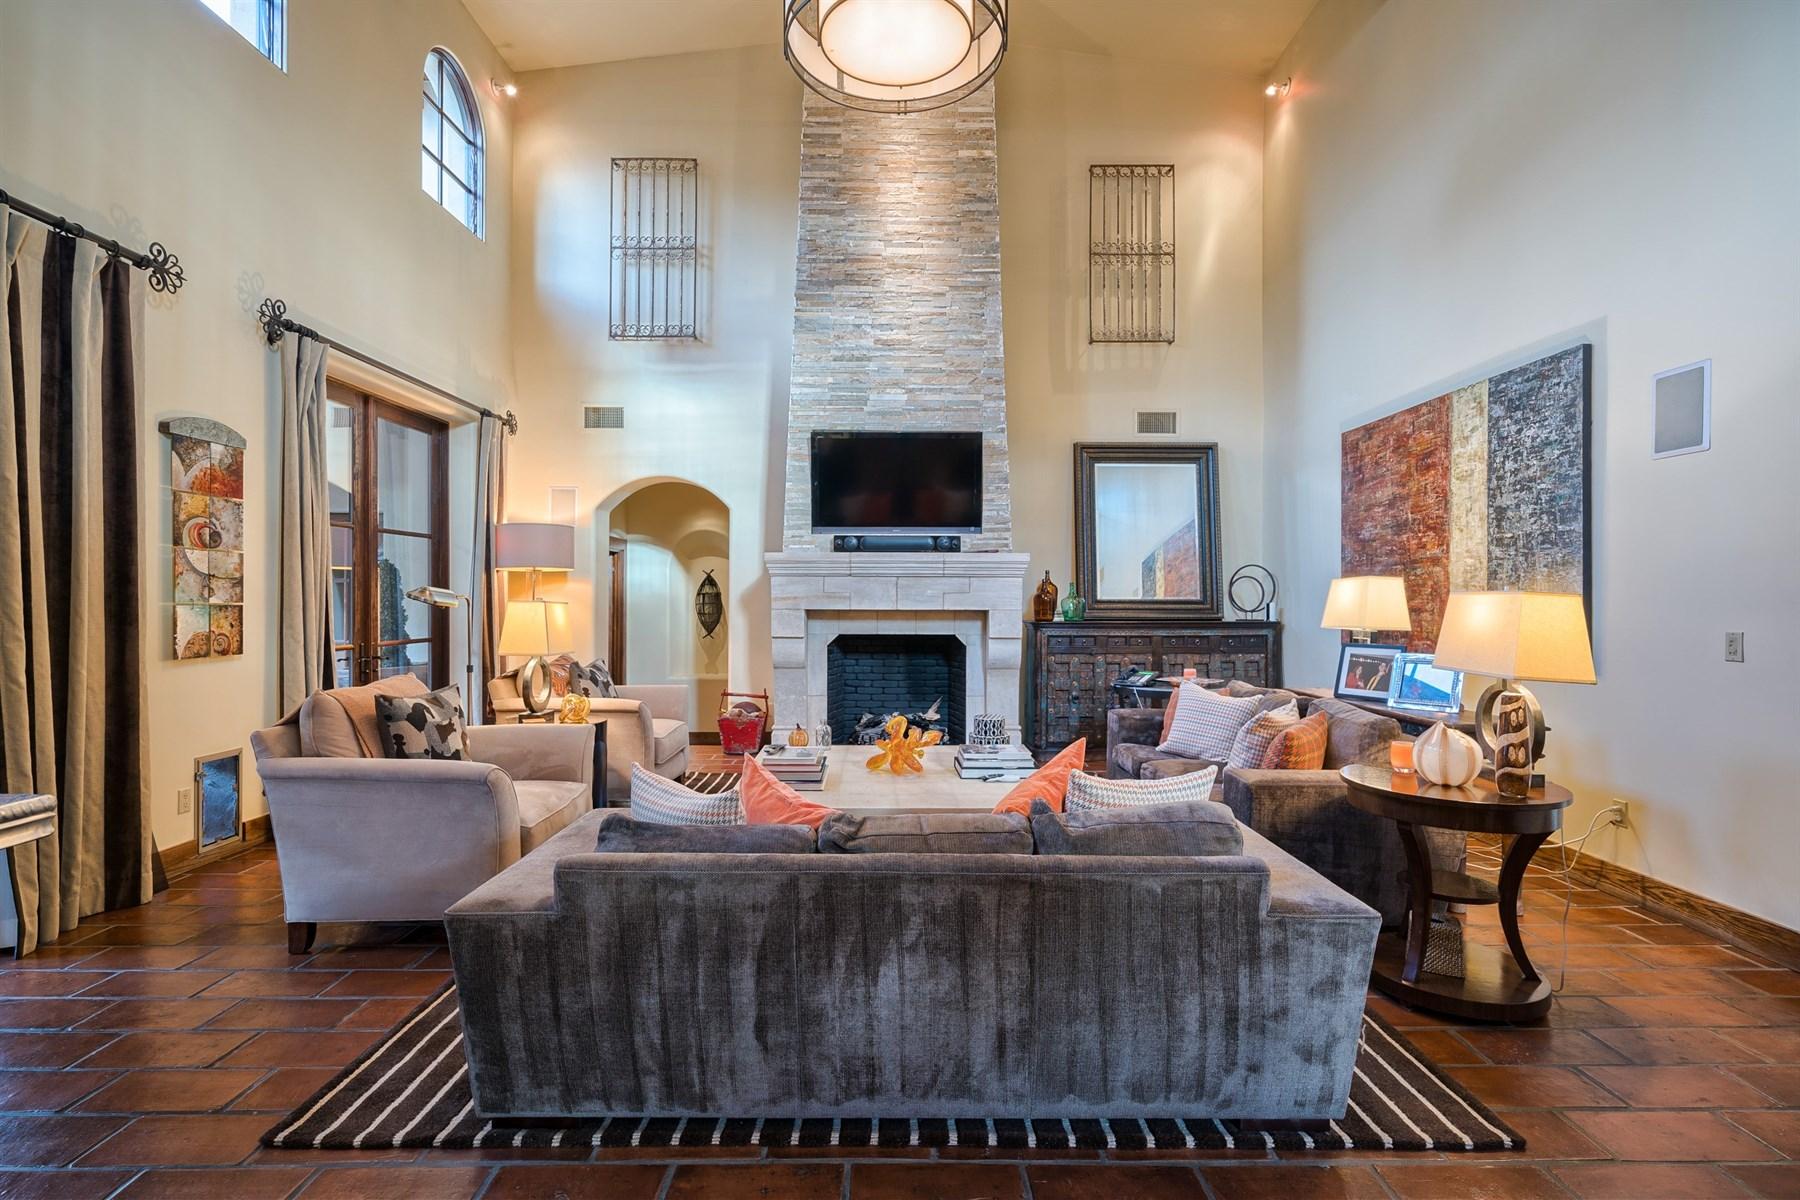 Single Family Home for Sale at Elegant Spanish revival estate 8243 N Mockingbird Ln Paradise Valley, Arizona, 85253 United States